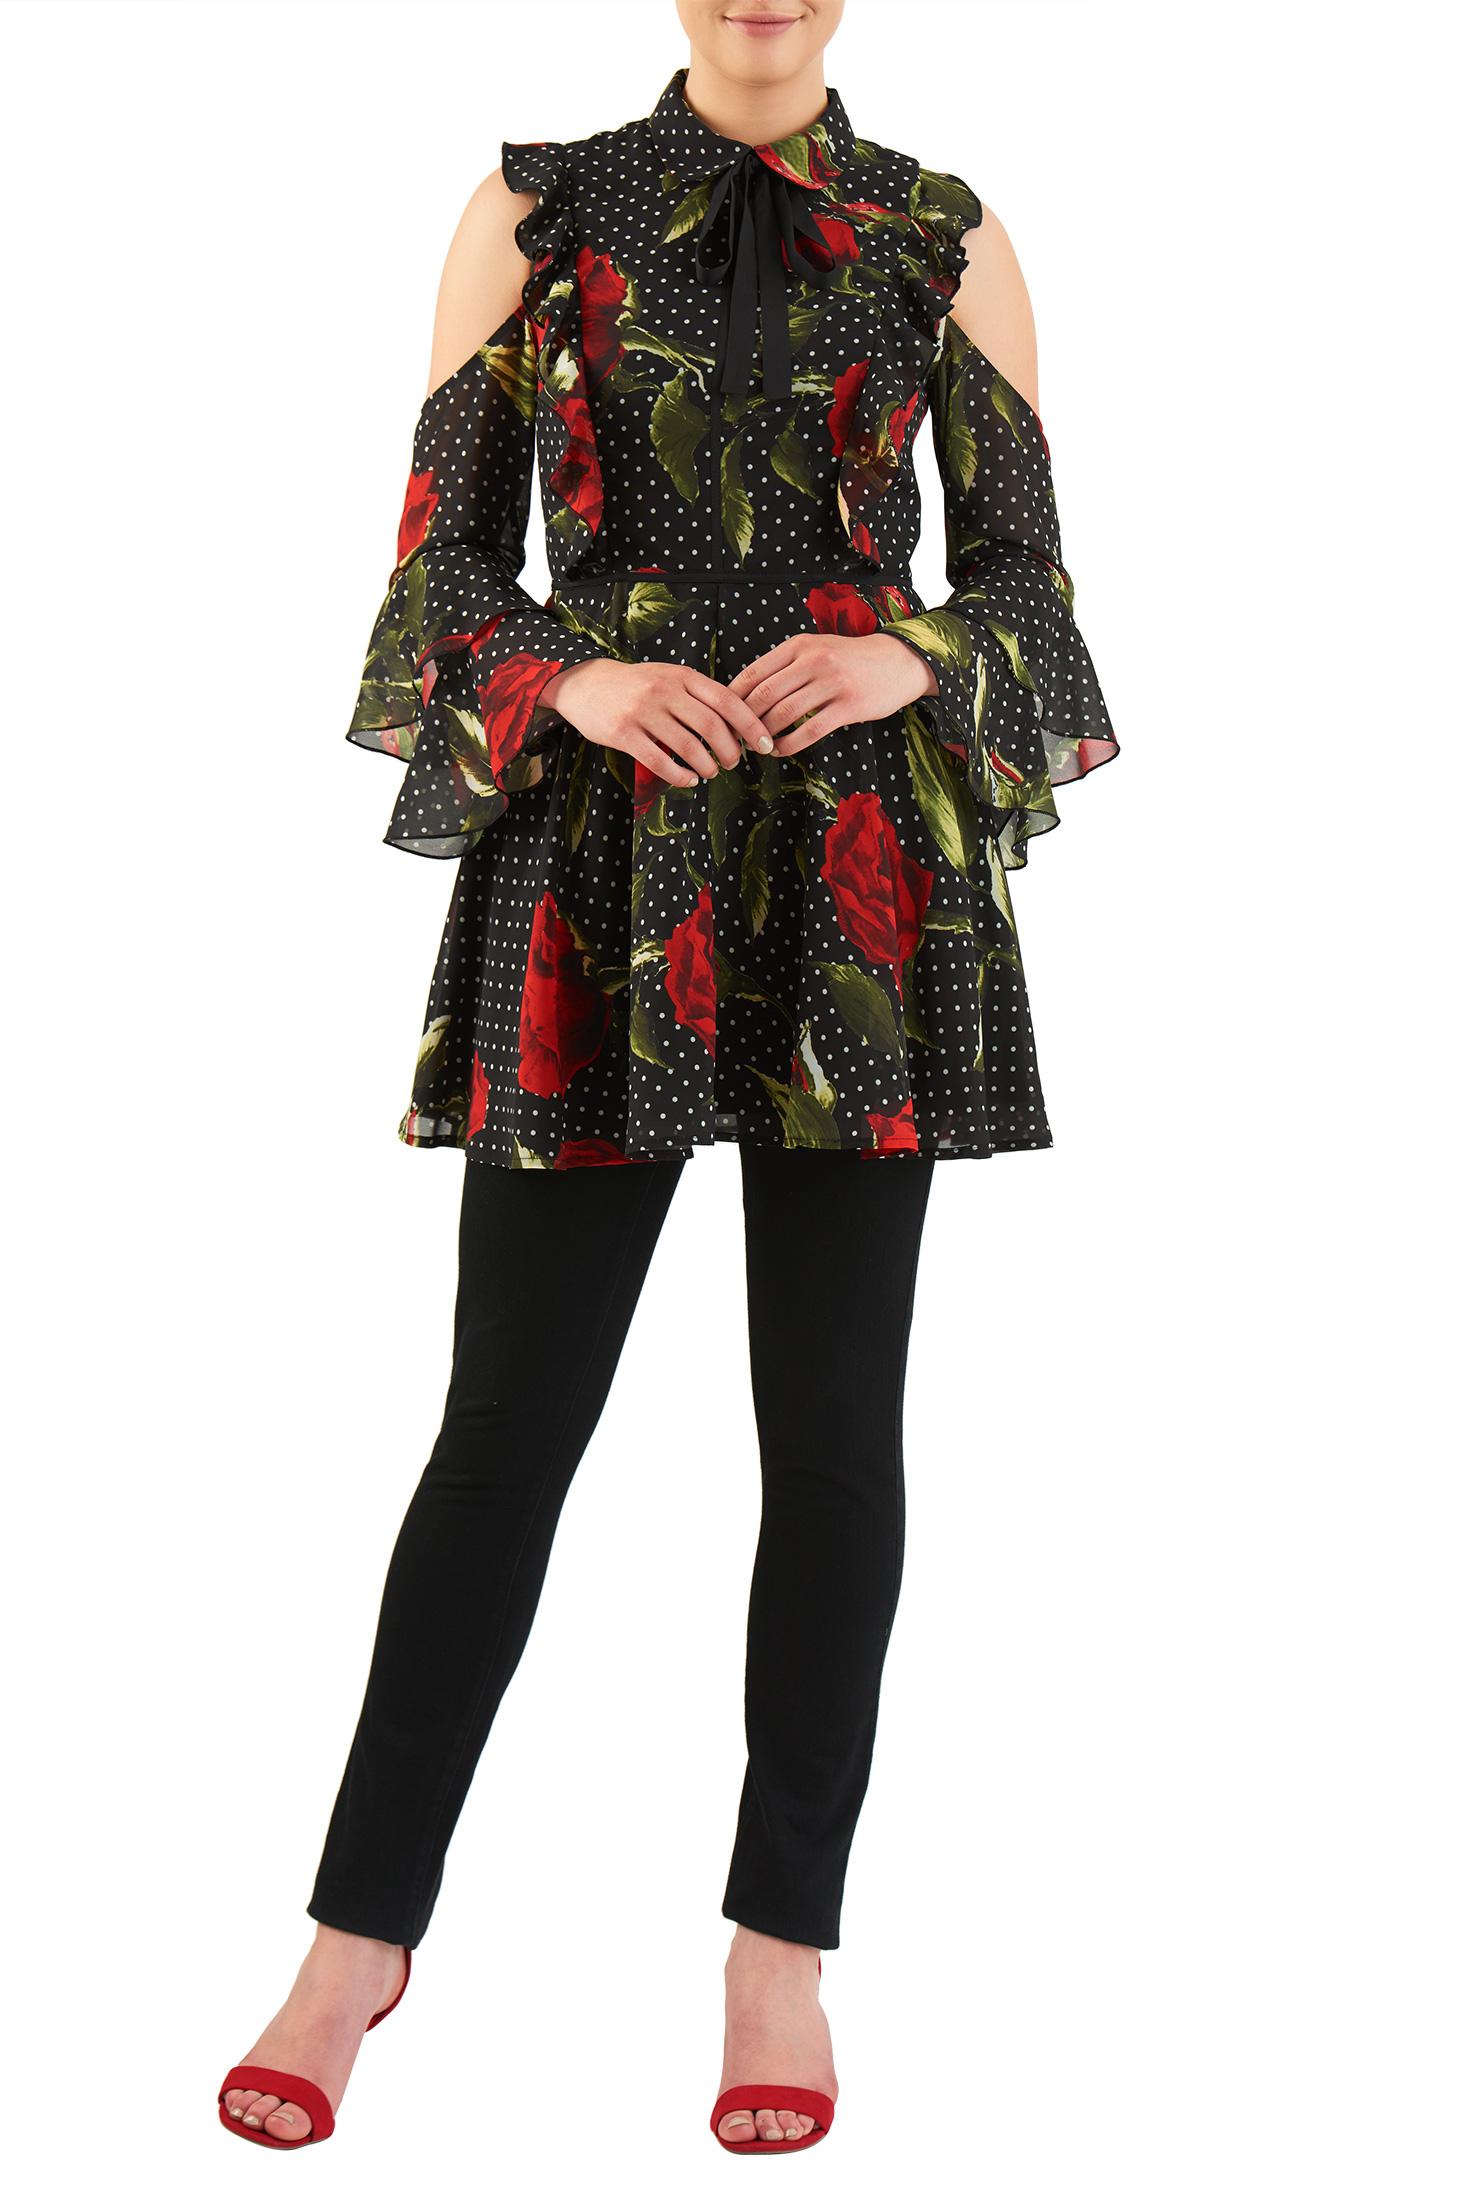 eShakti Women's Rose print georgette ruffle cold shoulder dress CL0050009